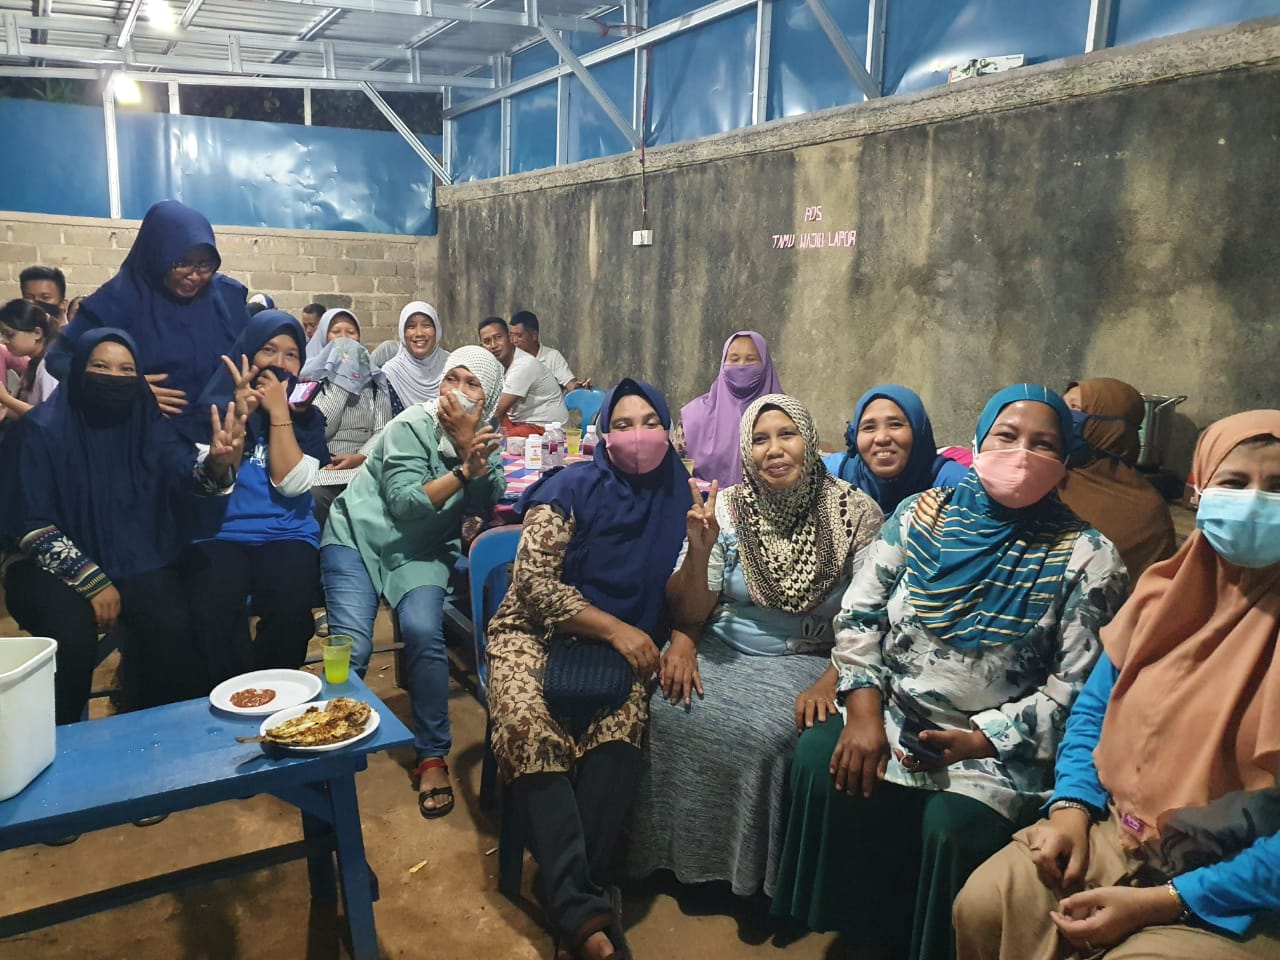 Tampung Aspirasi Warga, Rina Febriani Reses Di Kampung Suka Jaya